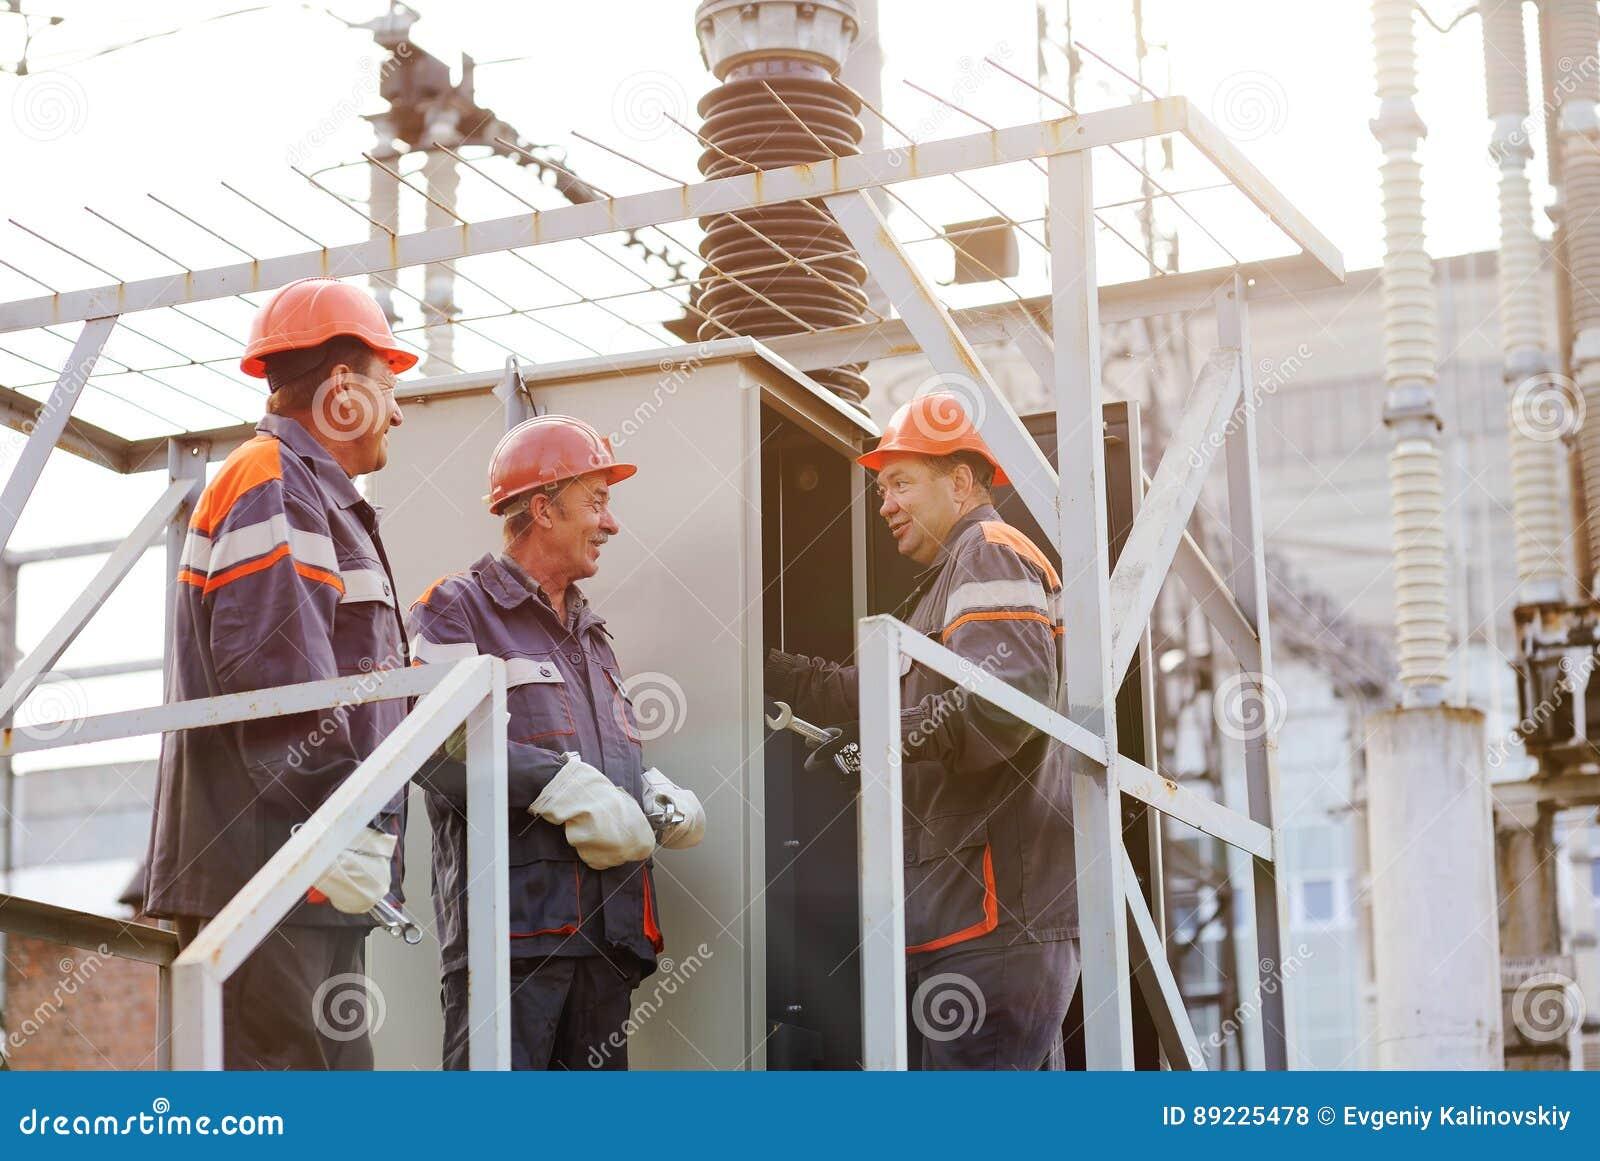 Workers Repairing Power Transformer Stock Photo - Image of